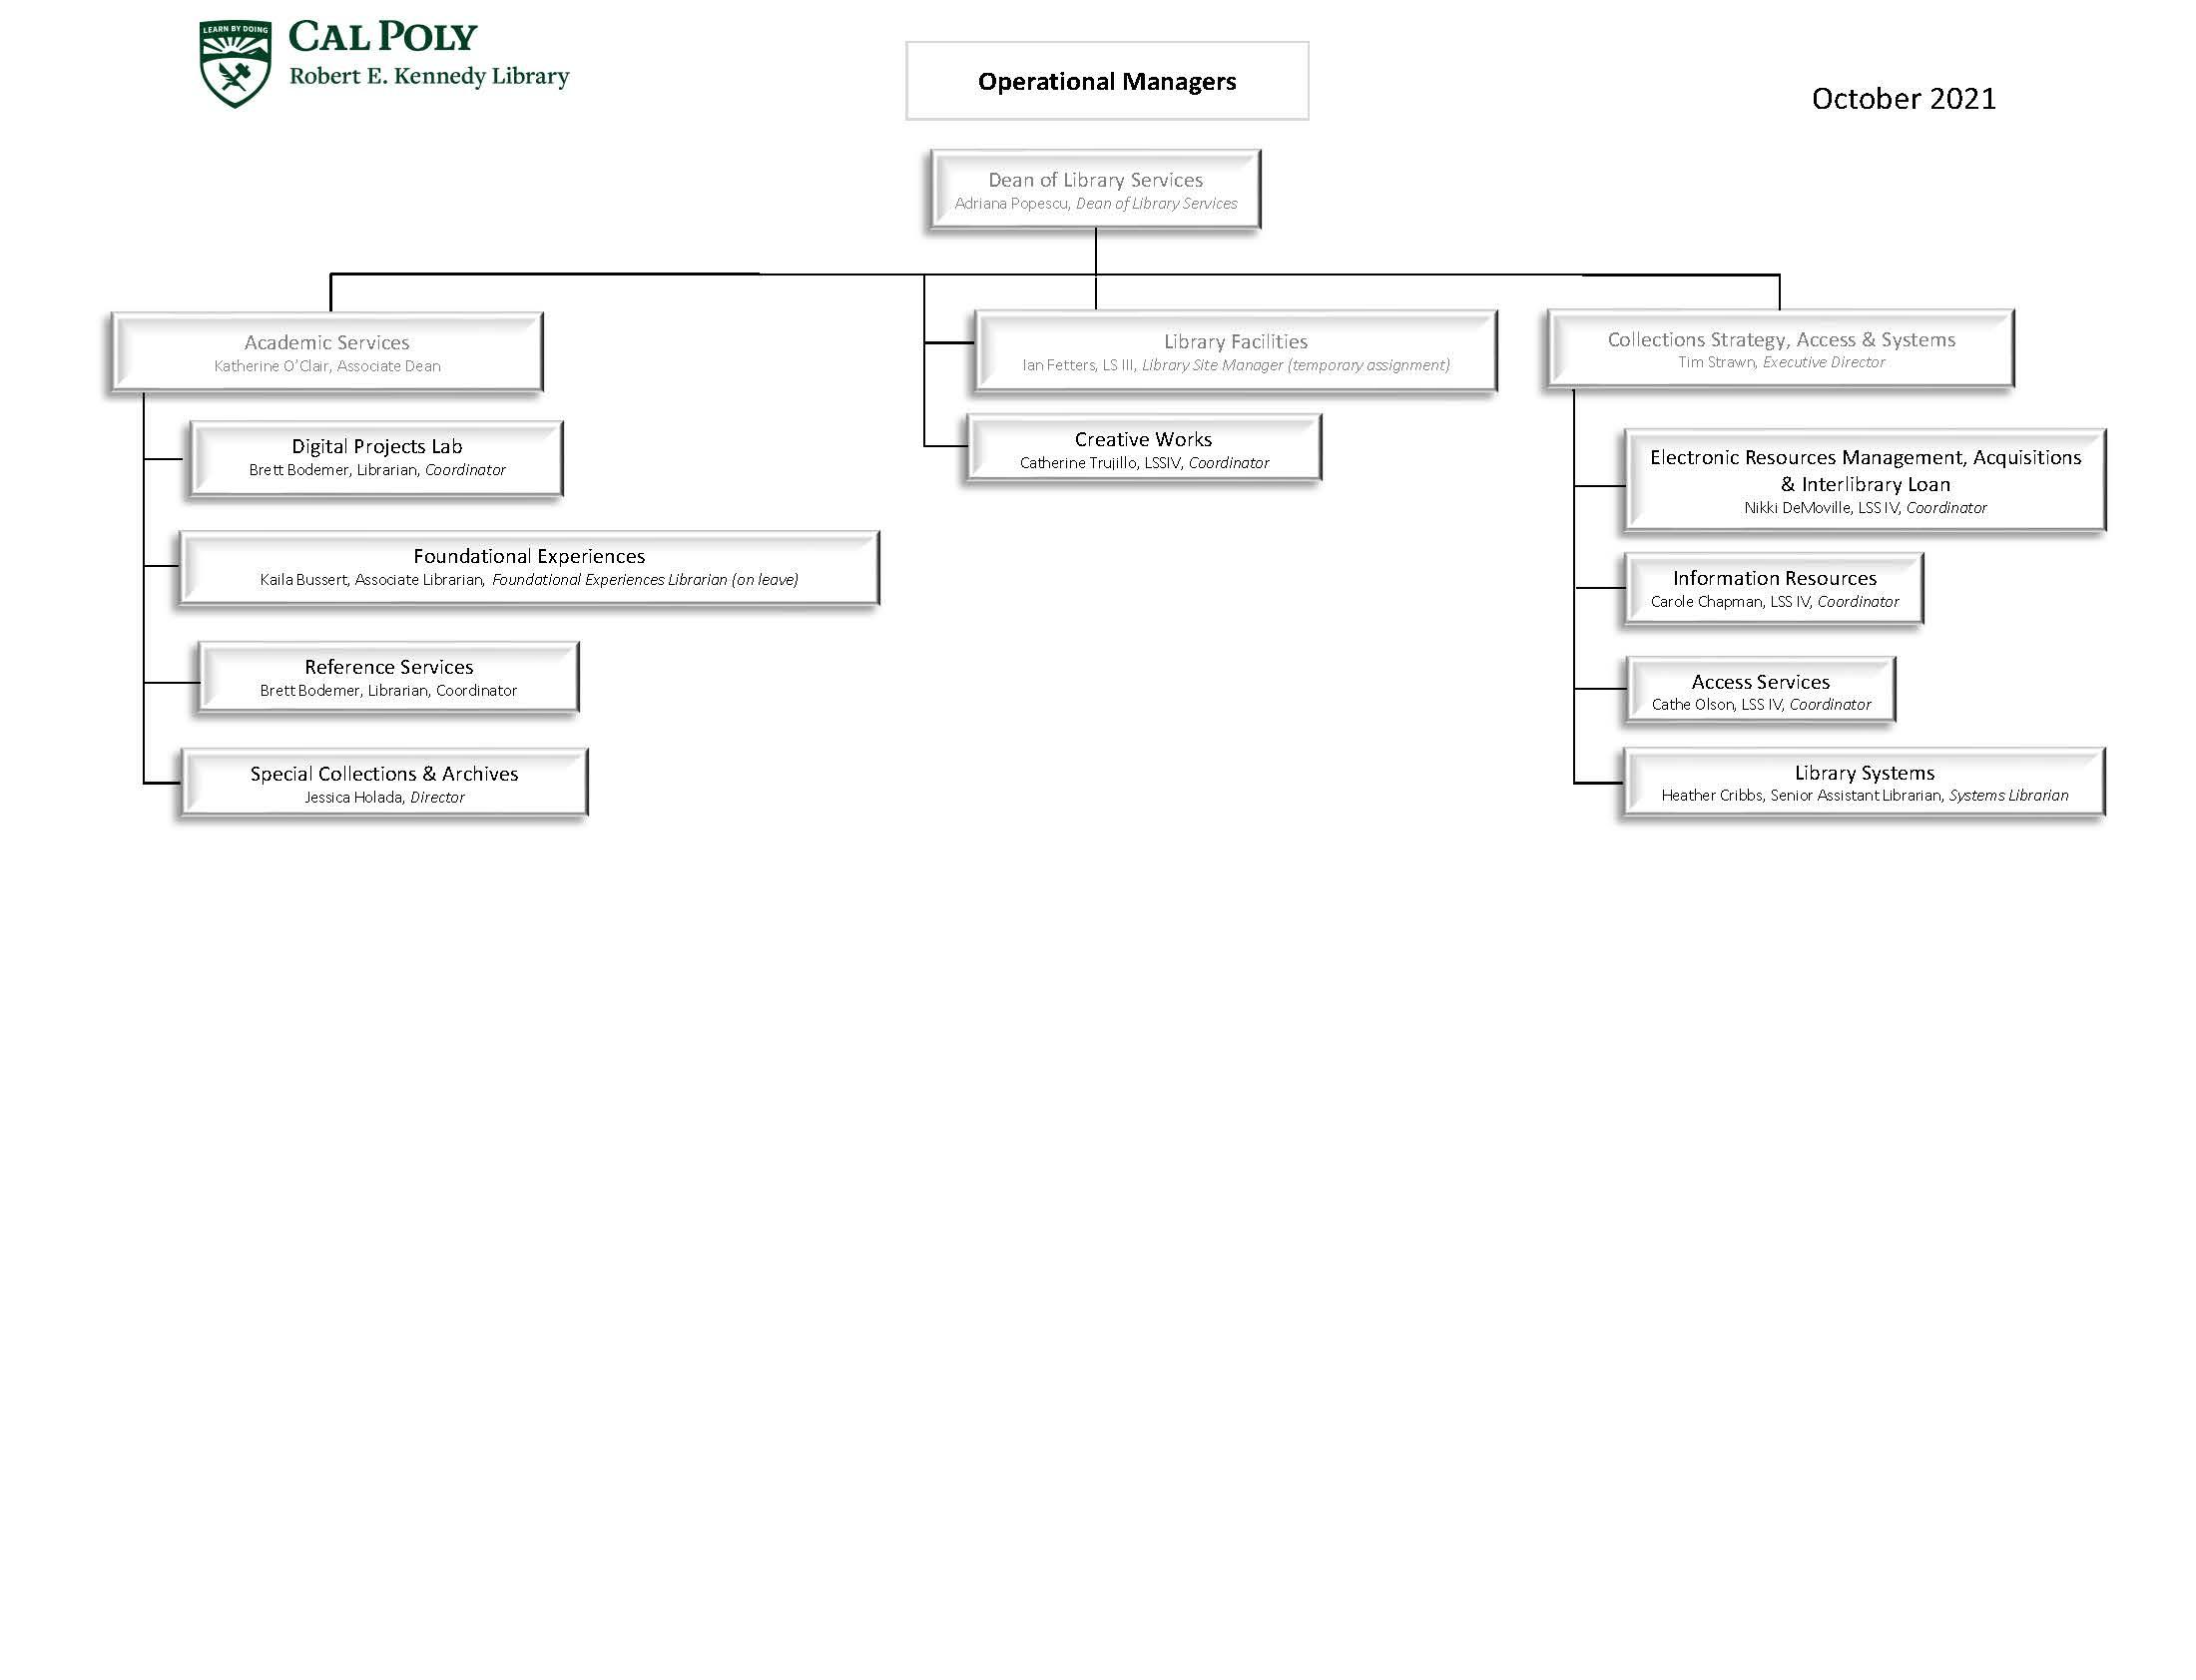 Organizational Chart Managers